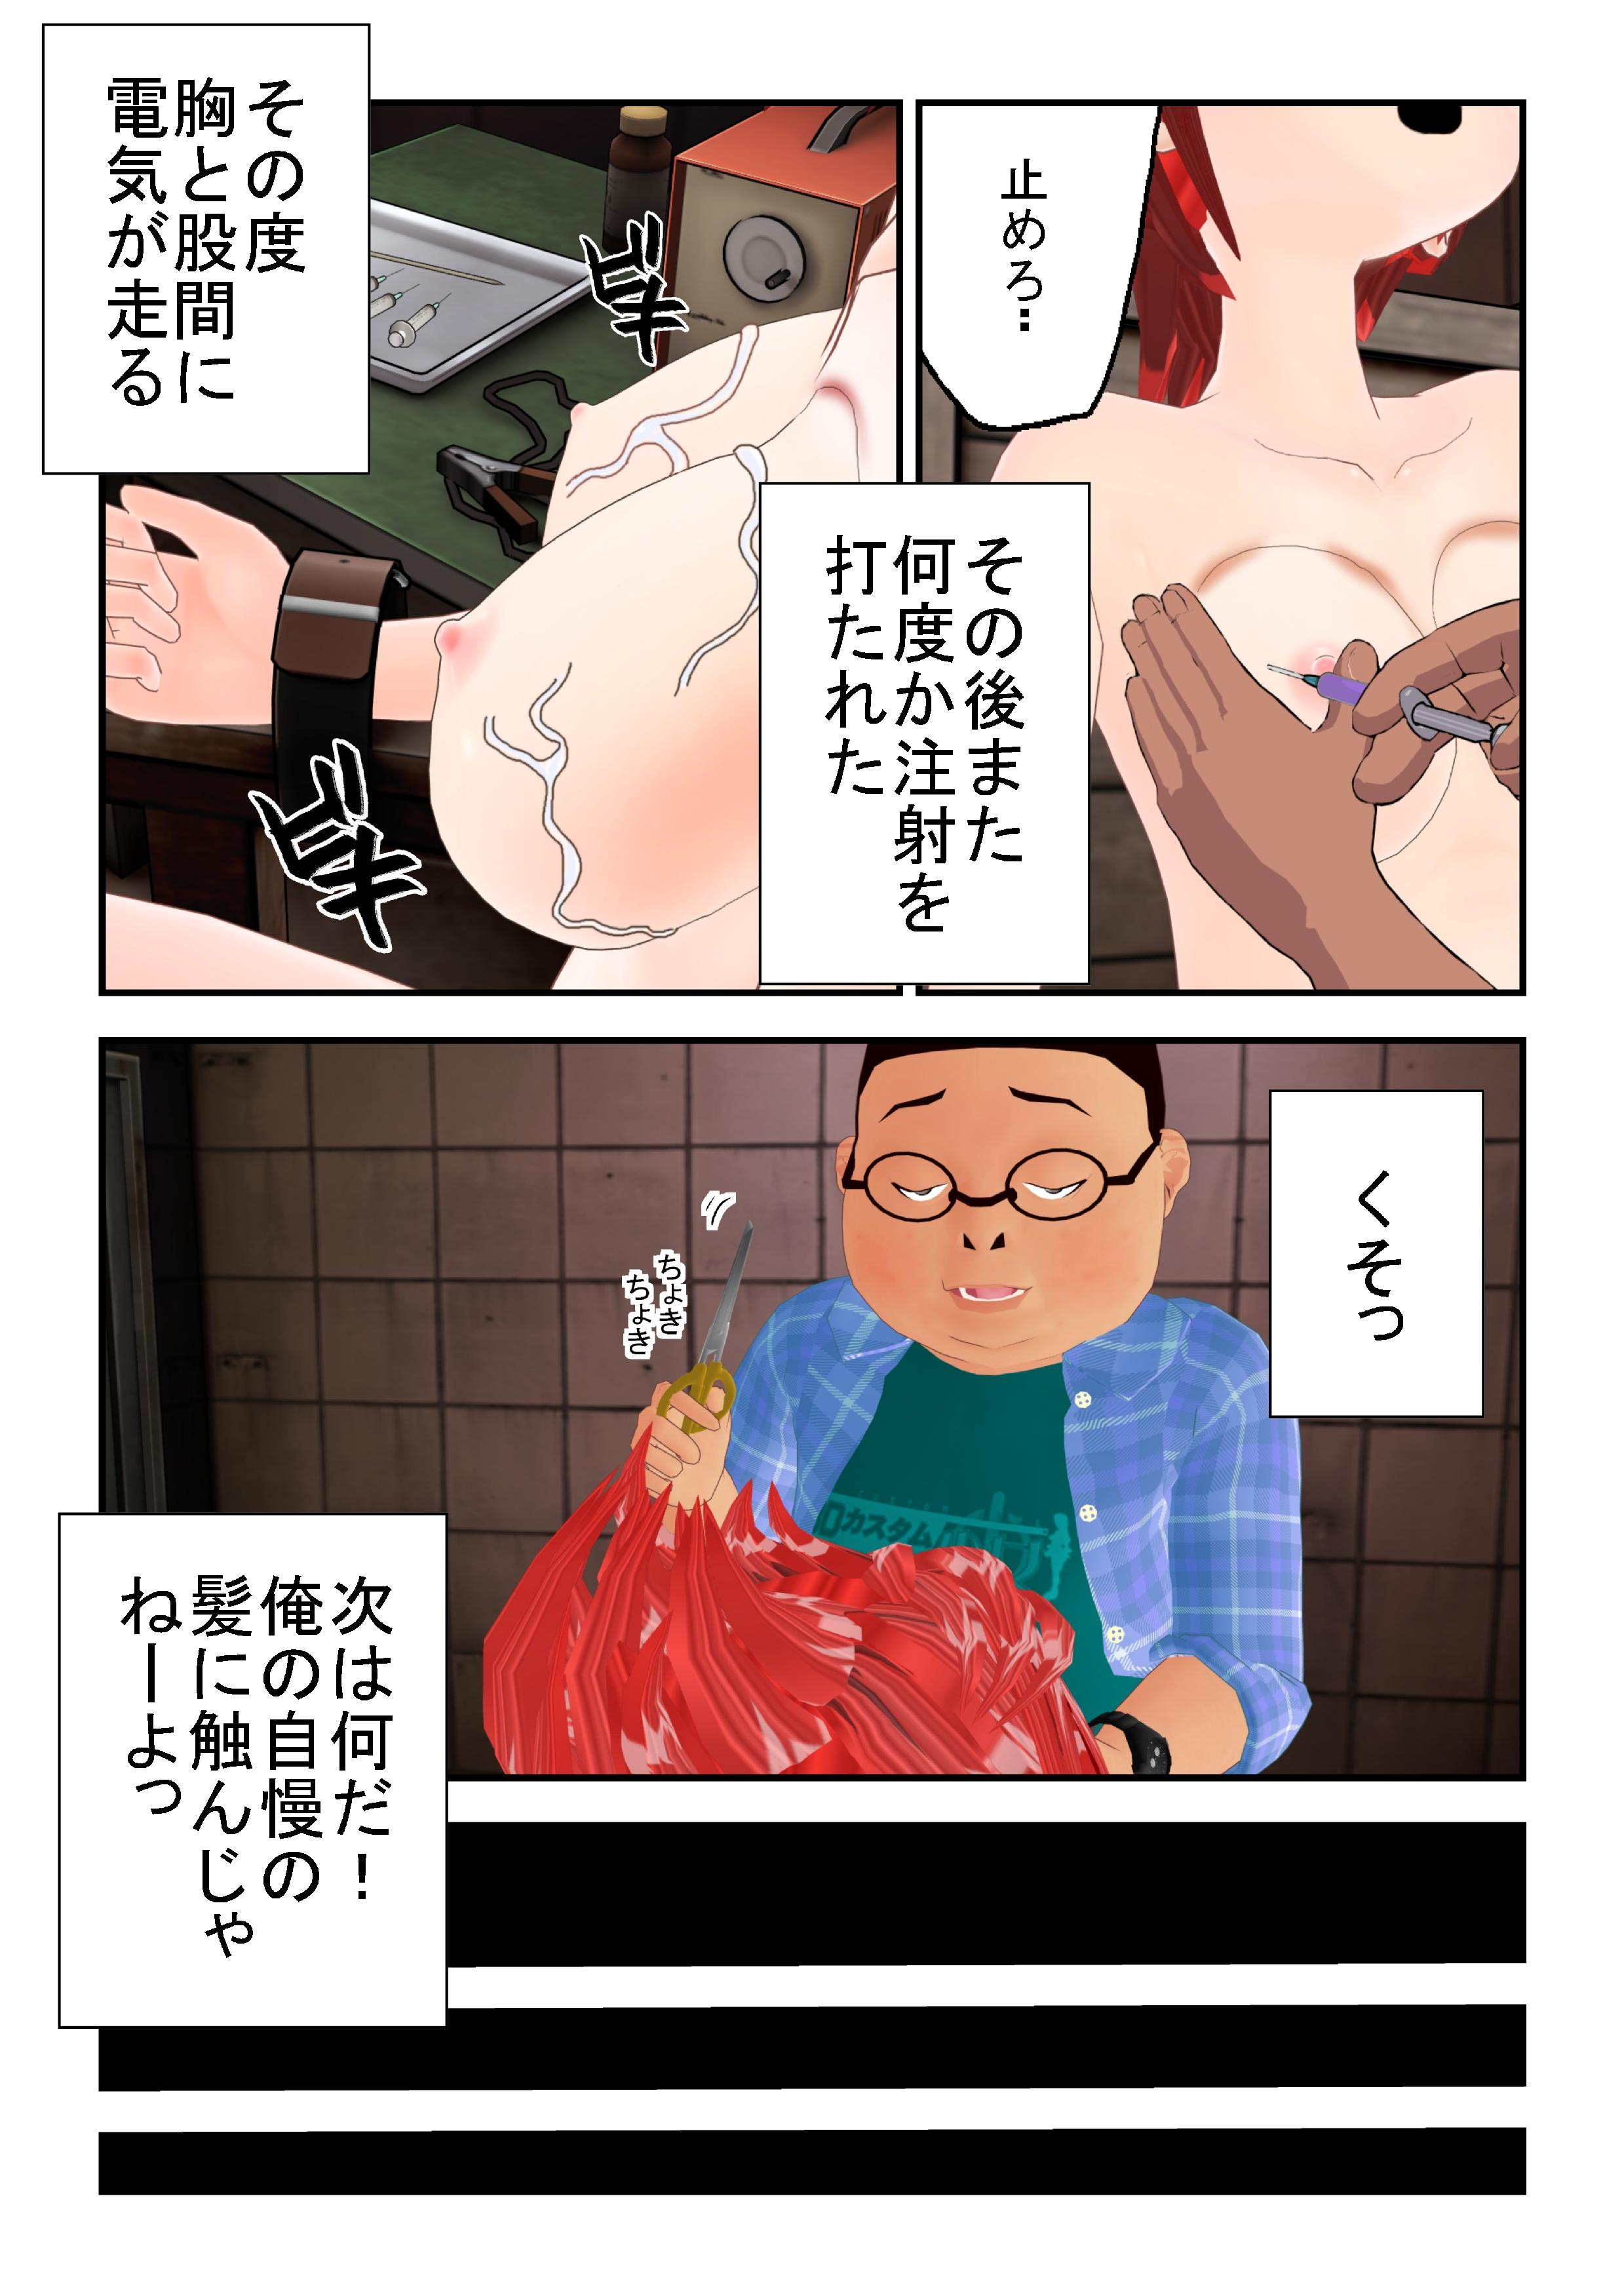 muteki_0012_2.jpg